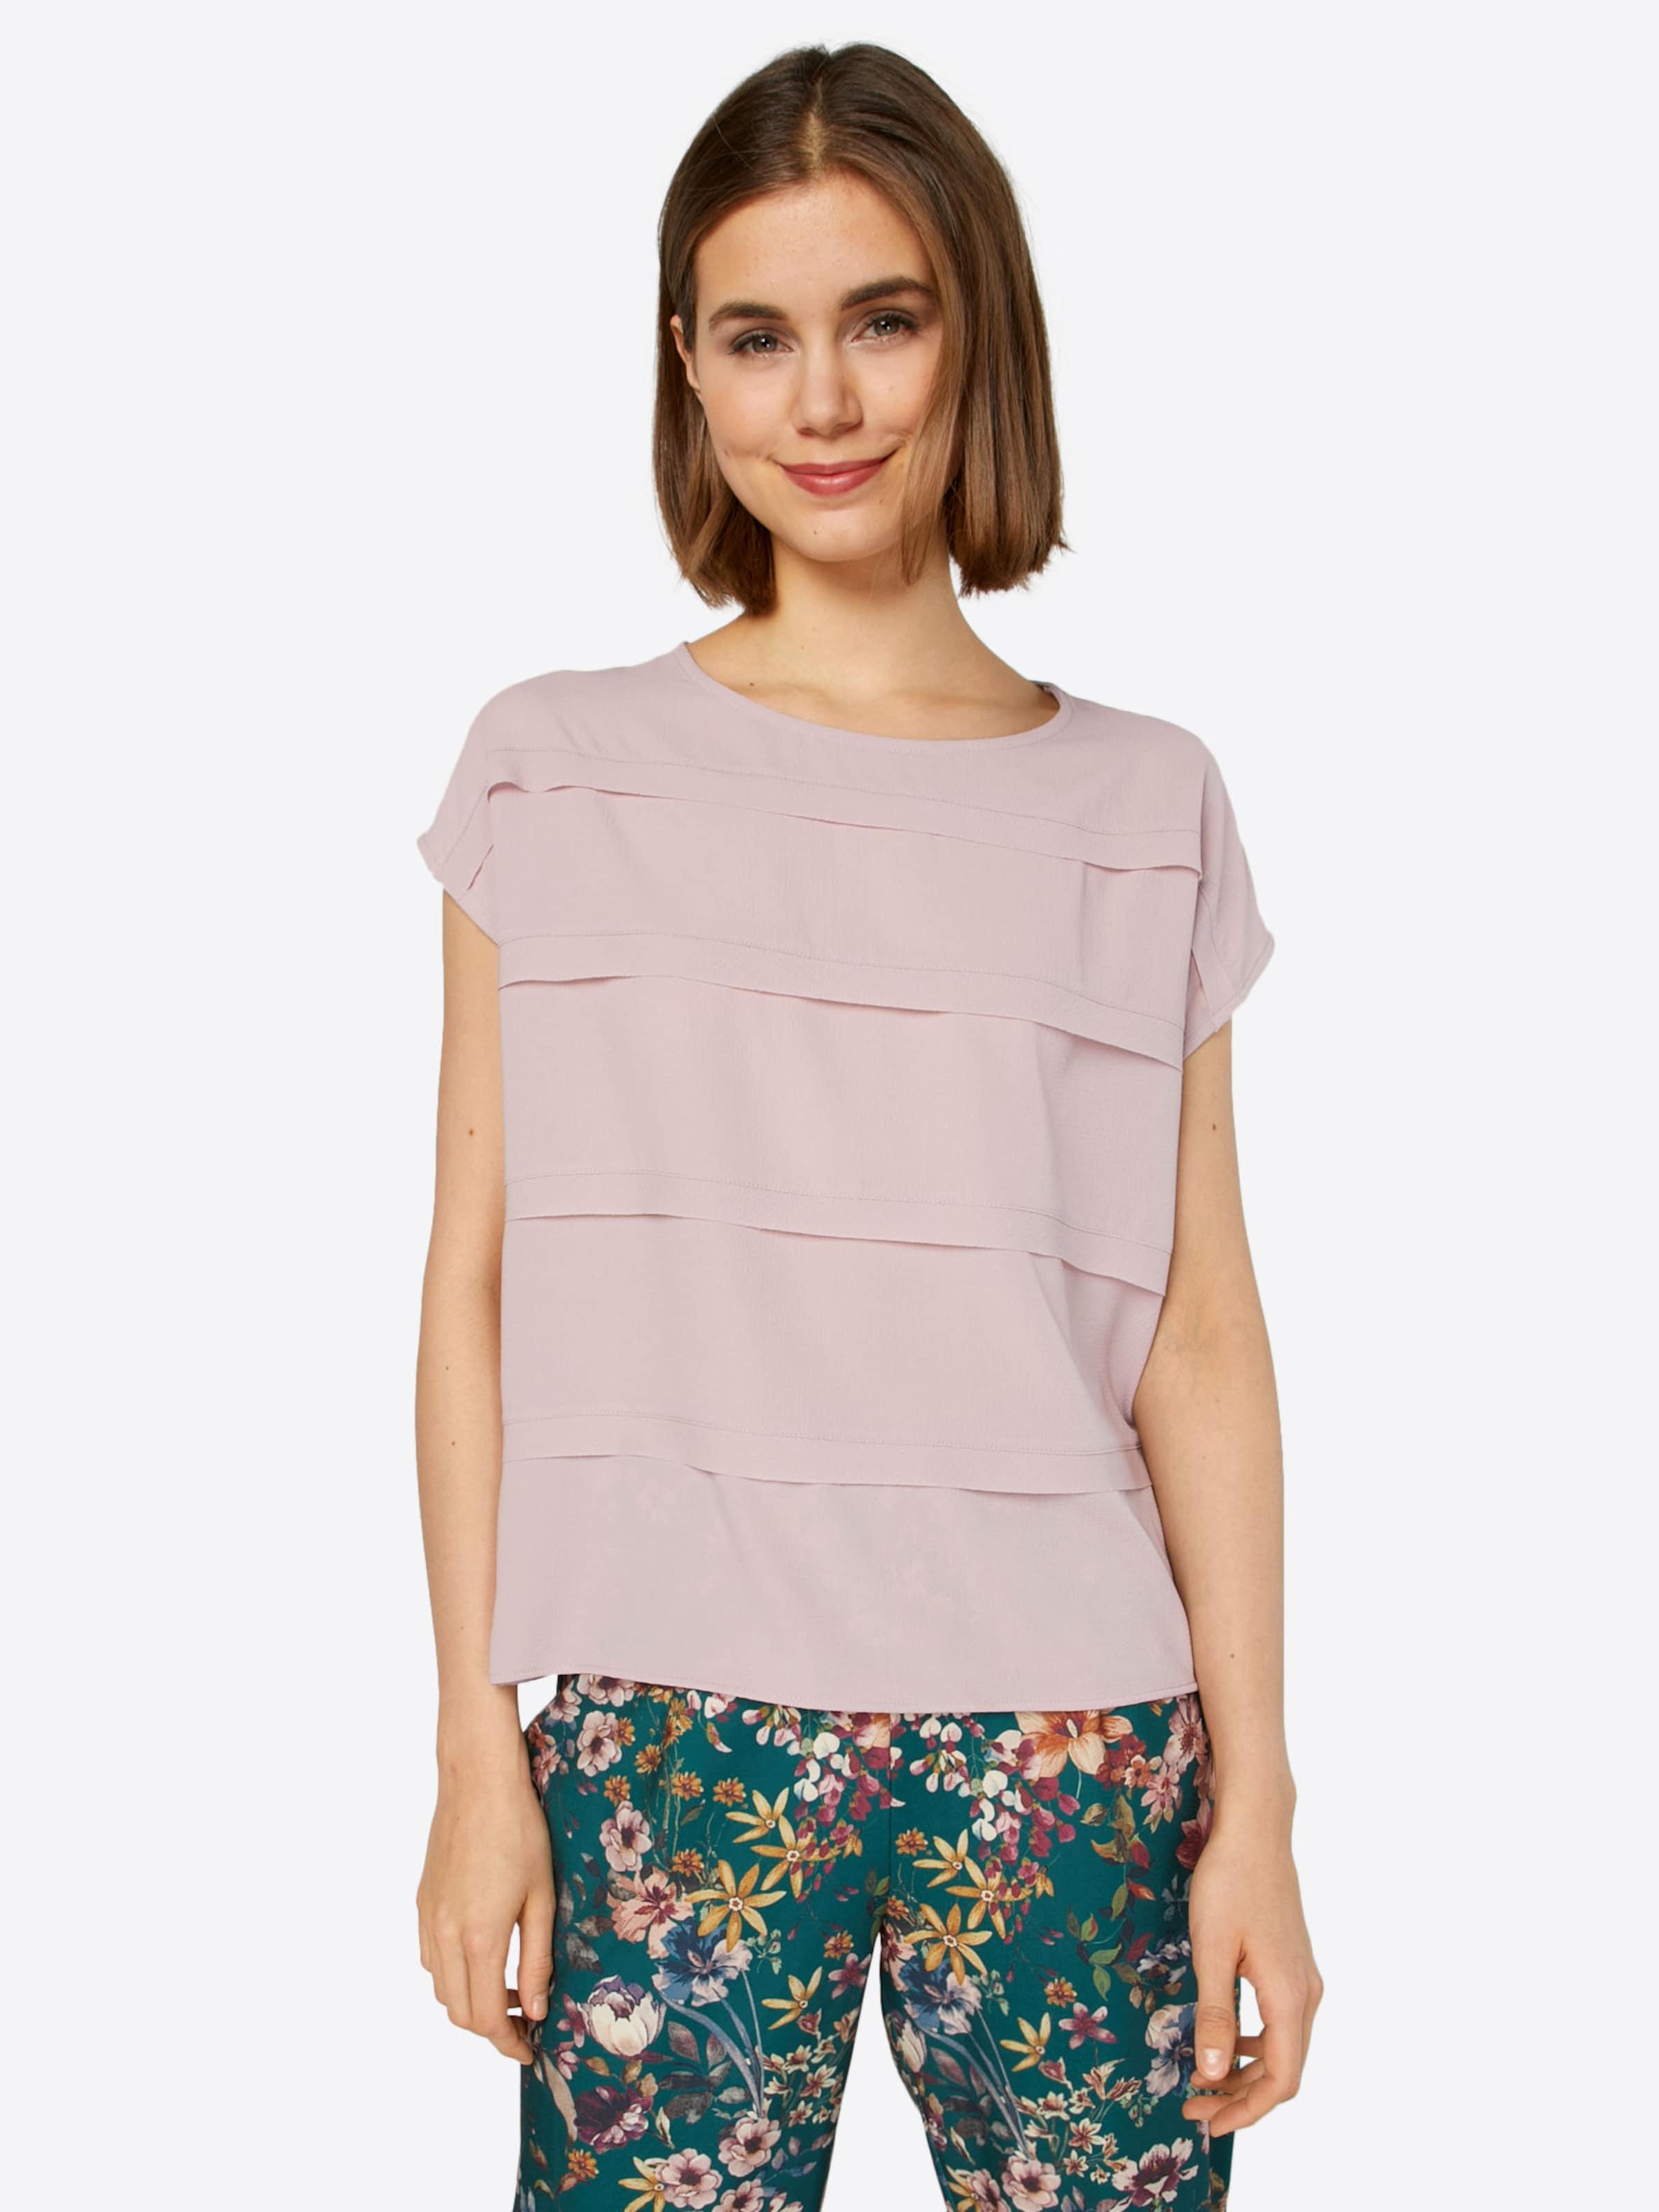 Betty & Co Shirt mit Falten Bester Großhandel Günstig Online Beeile Dich ulC9gJzSB4